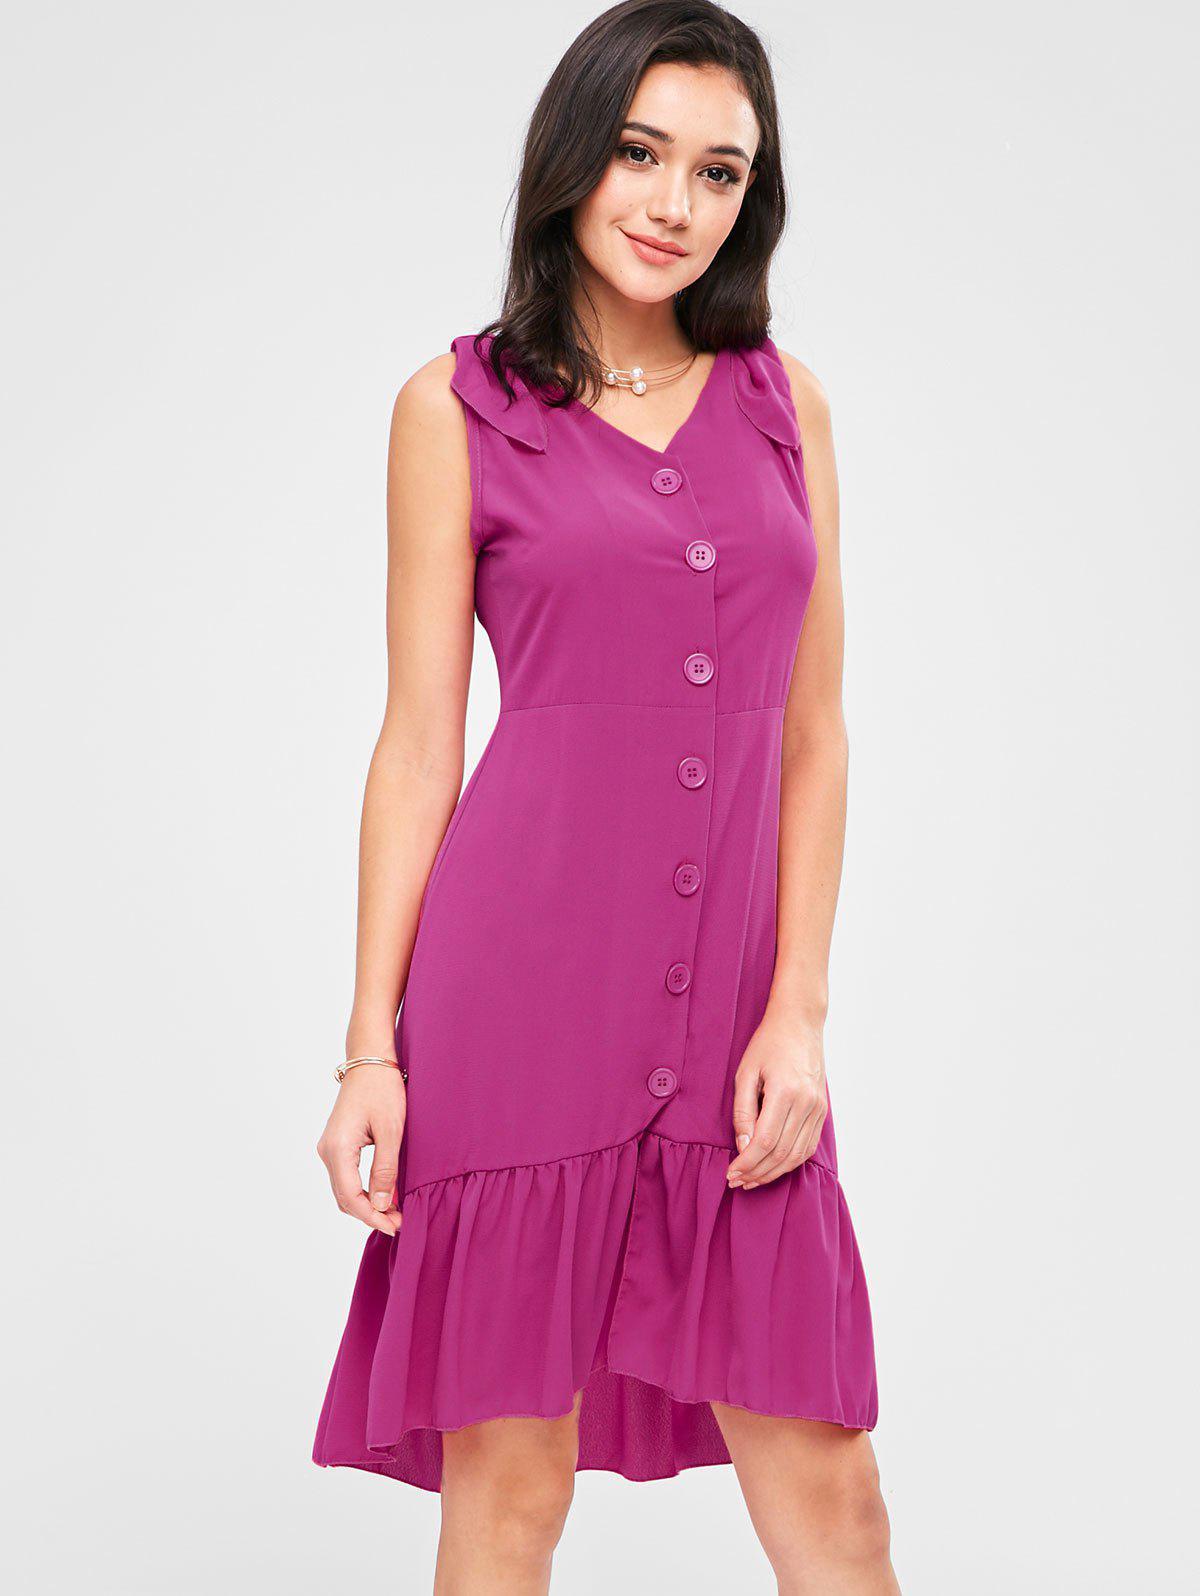 Ruffle Hemline Button Up Mini Dress